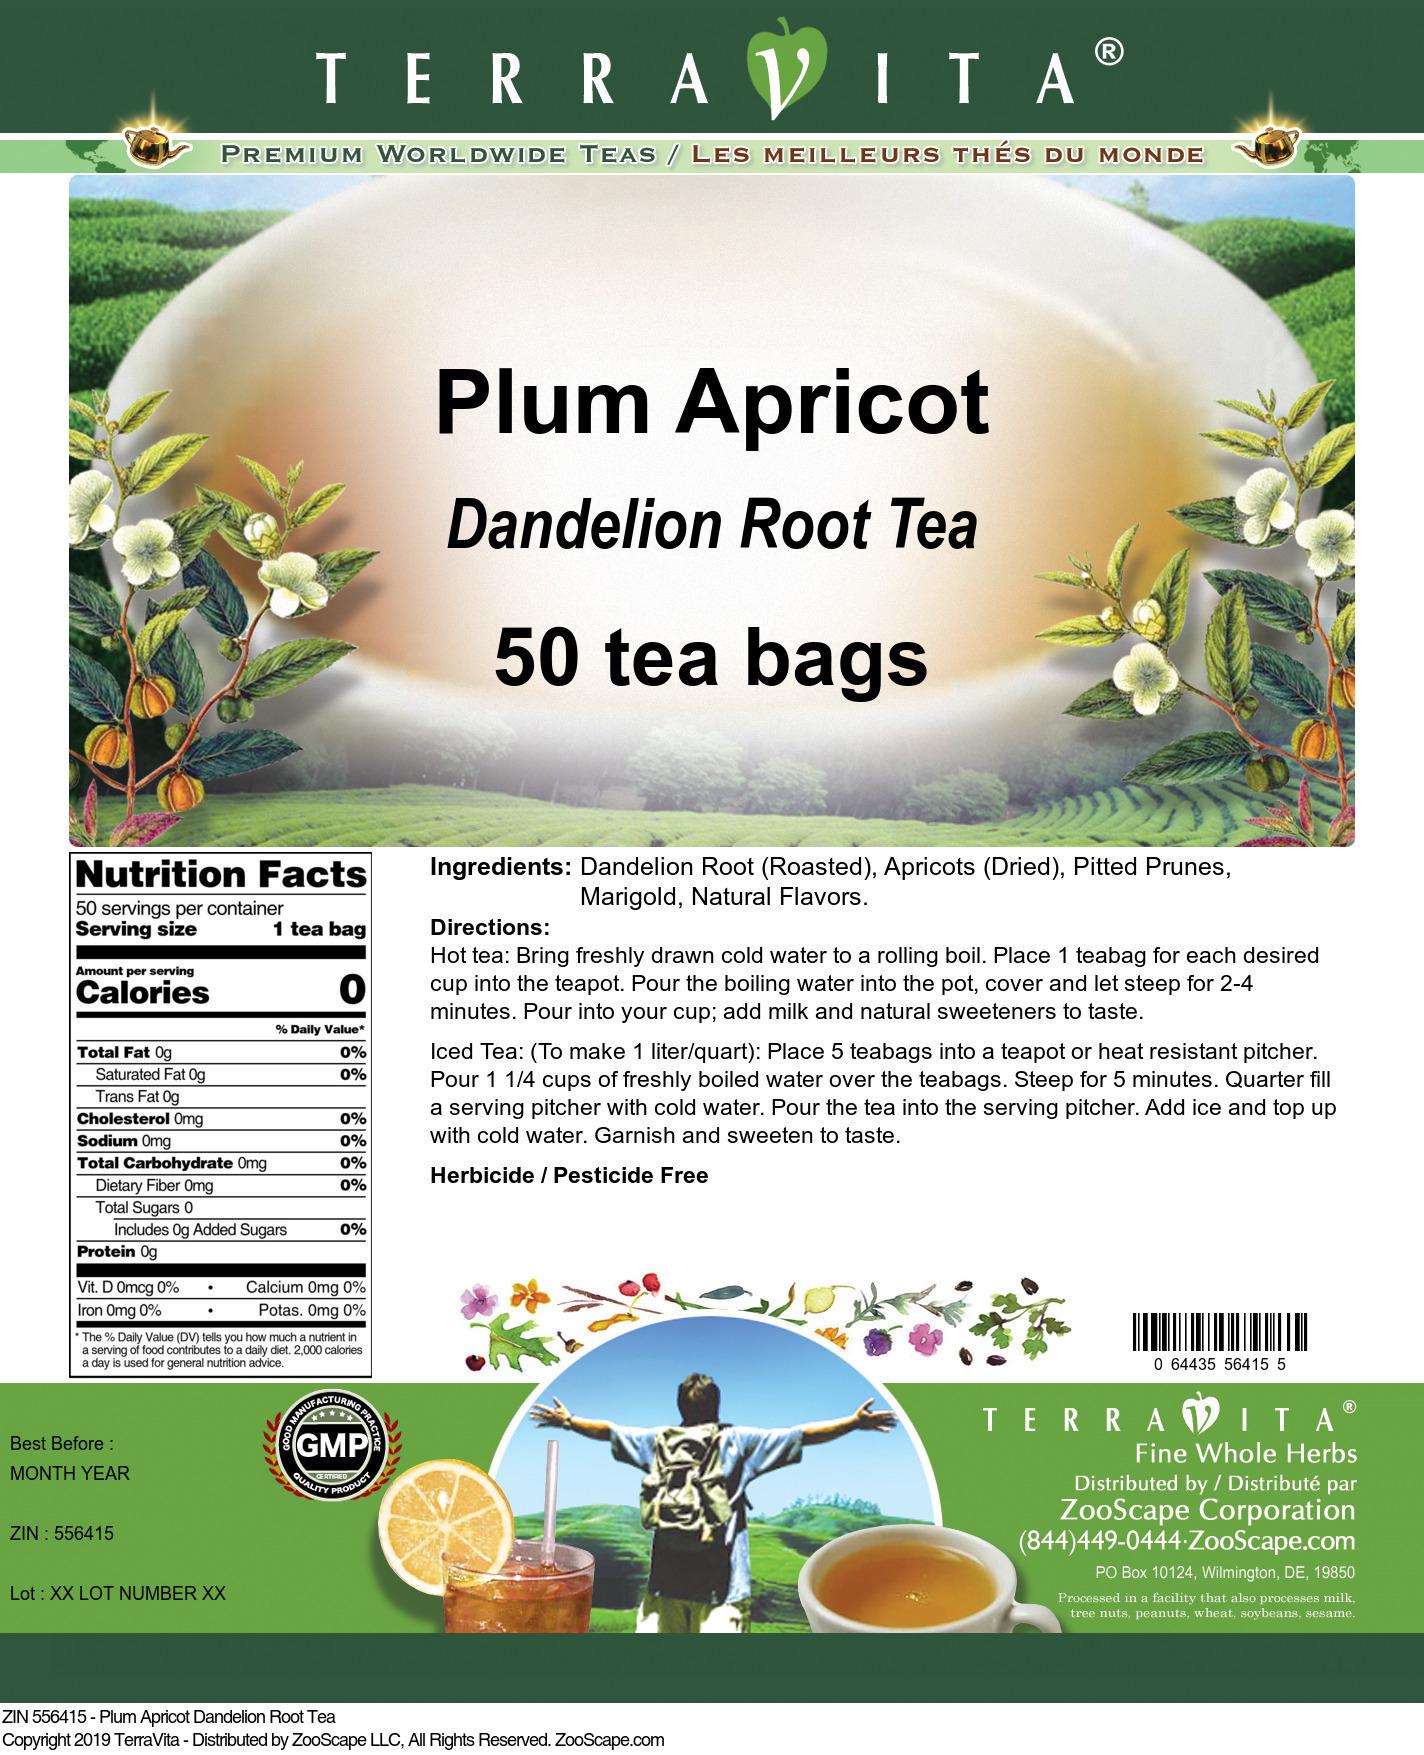 Plum Apricot Dandelion Root Tea